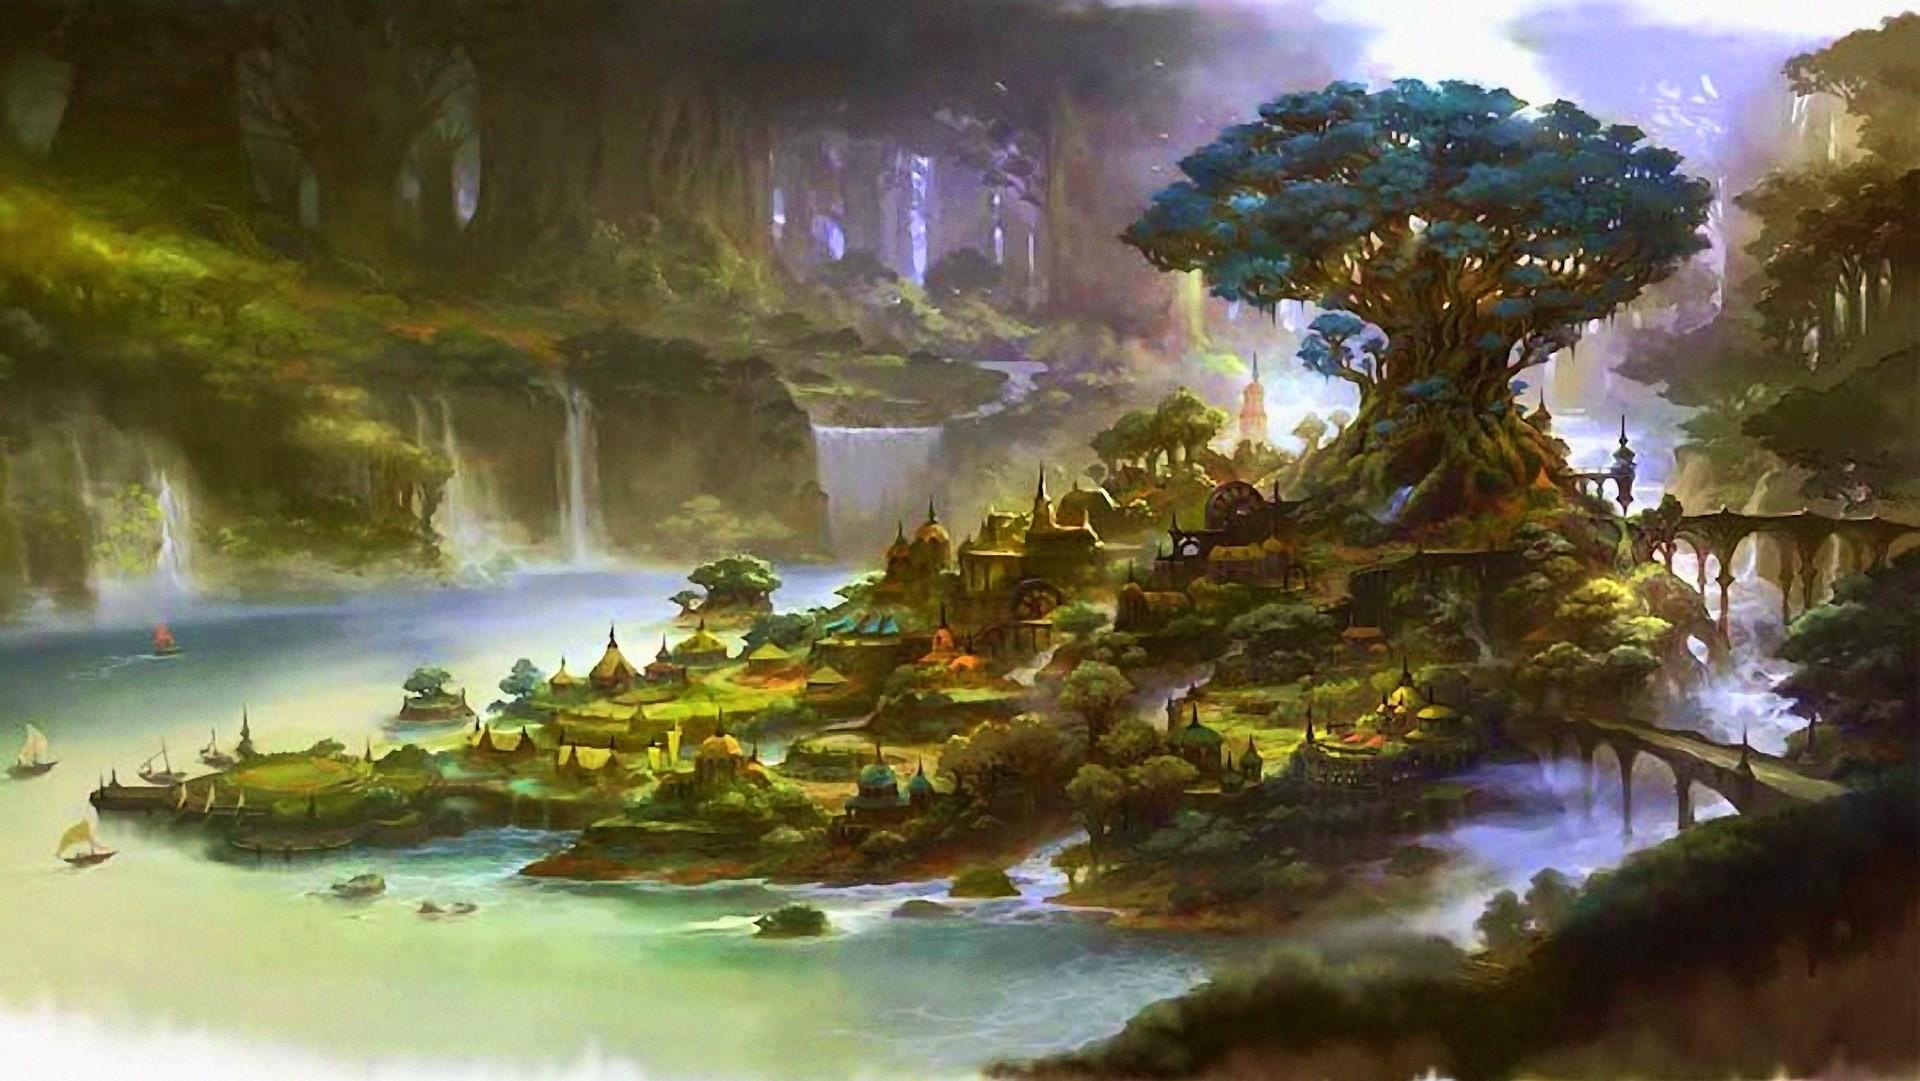 final fantasy xiv 1080p high quality